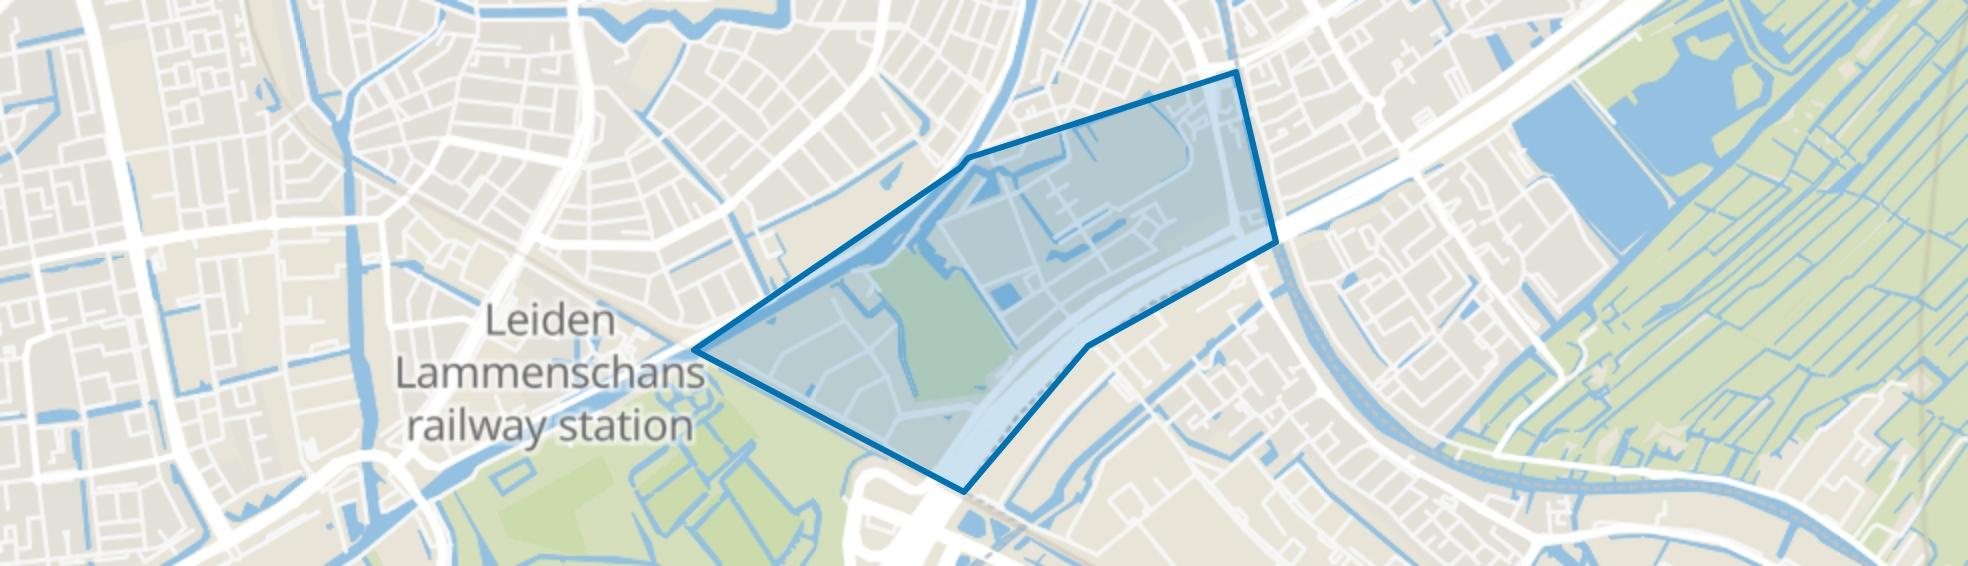 Roomburg, Leiden map